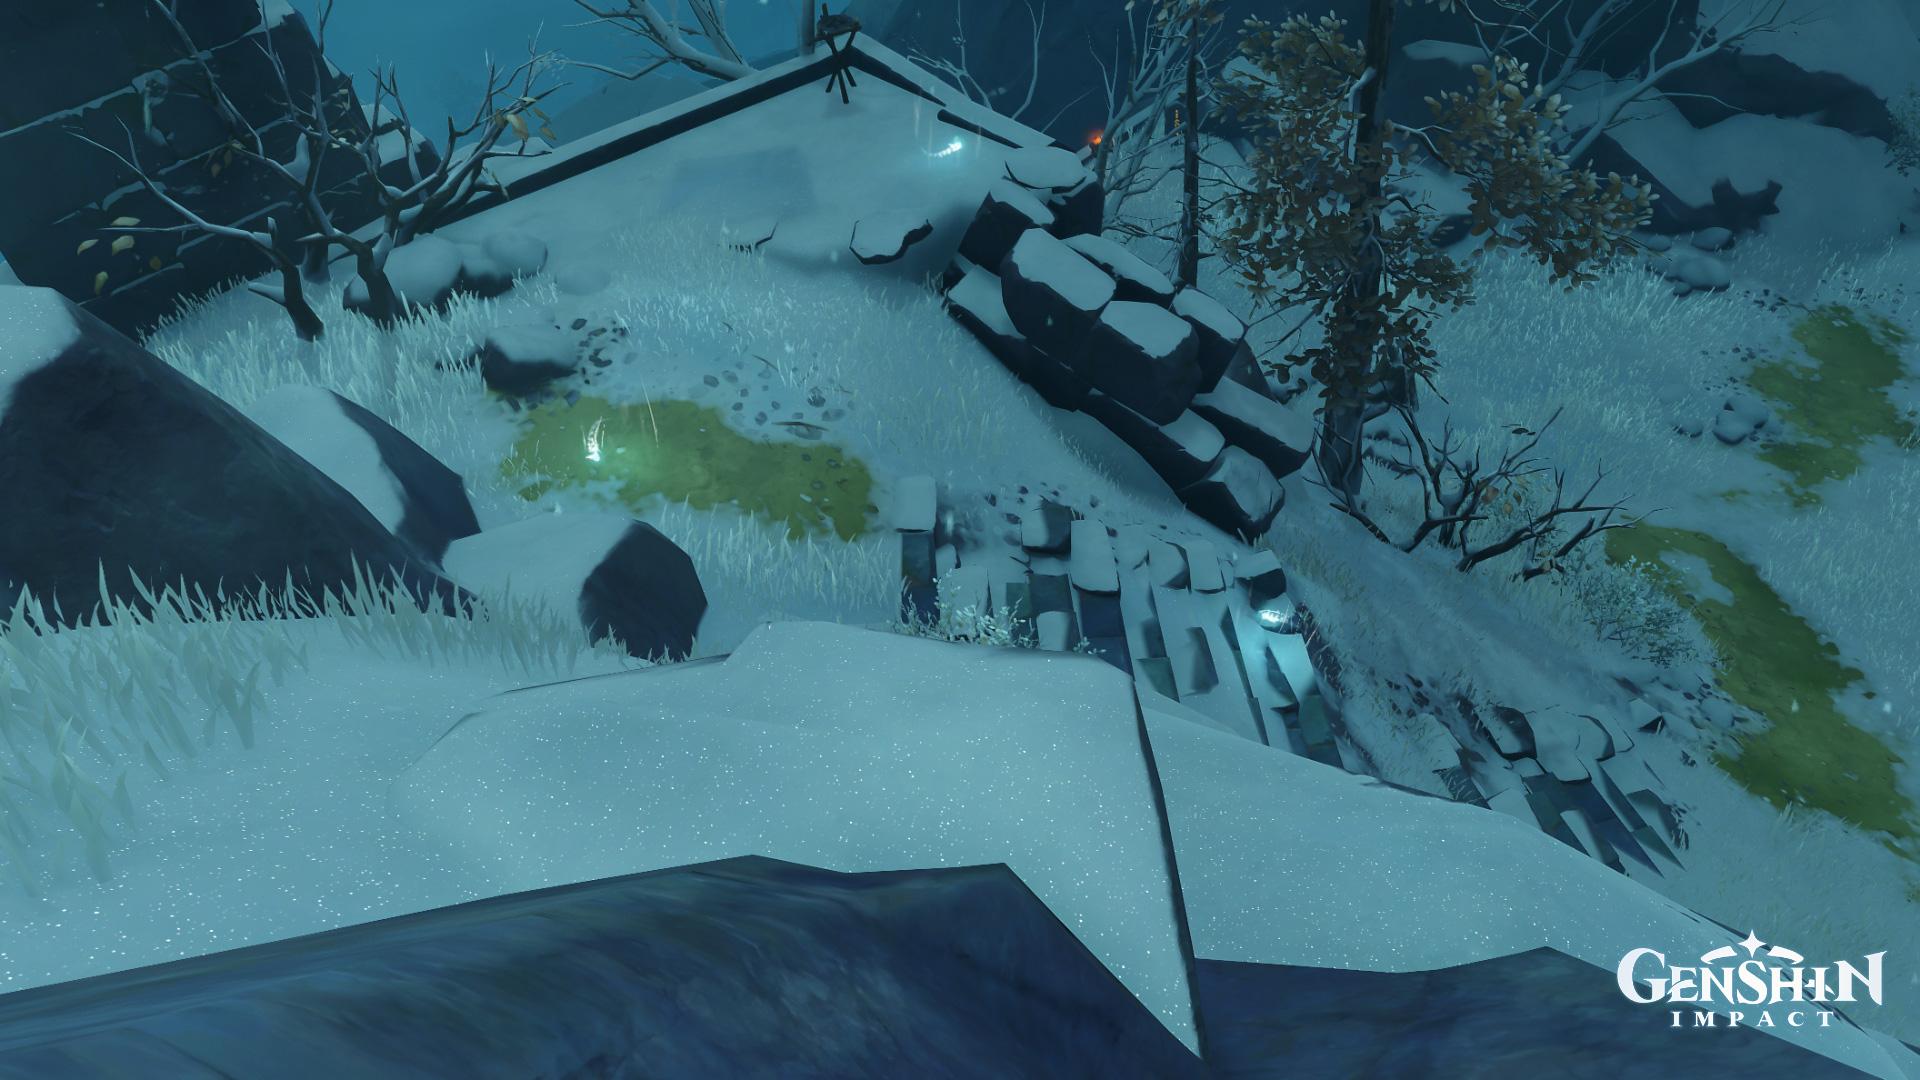 Boîte de prêtre Genshin Impact